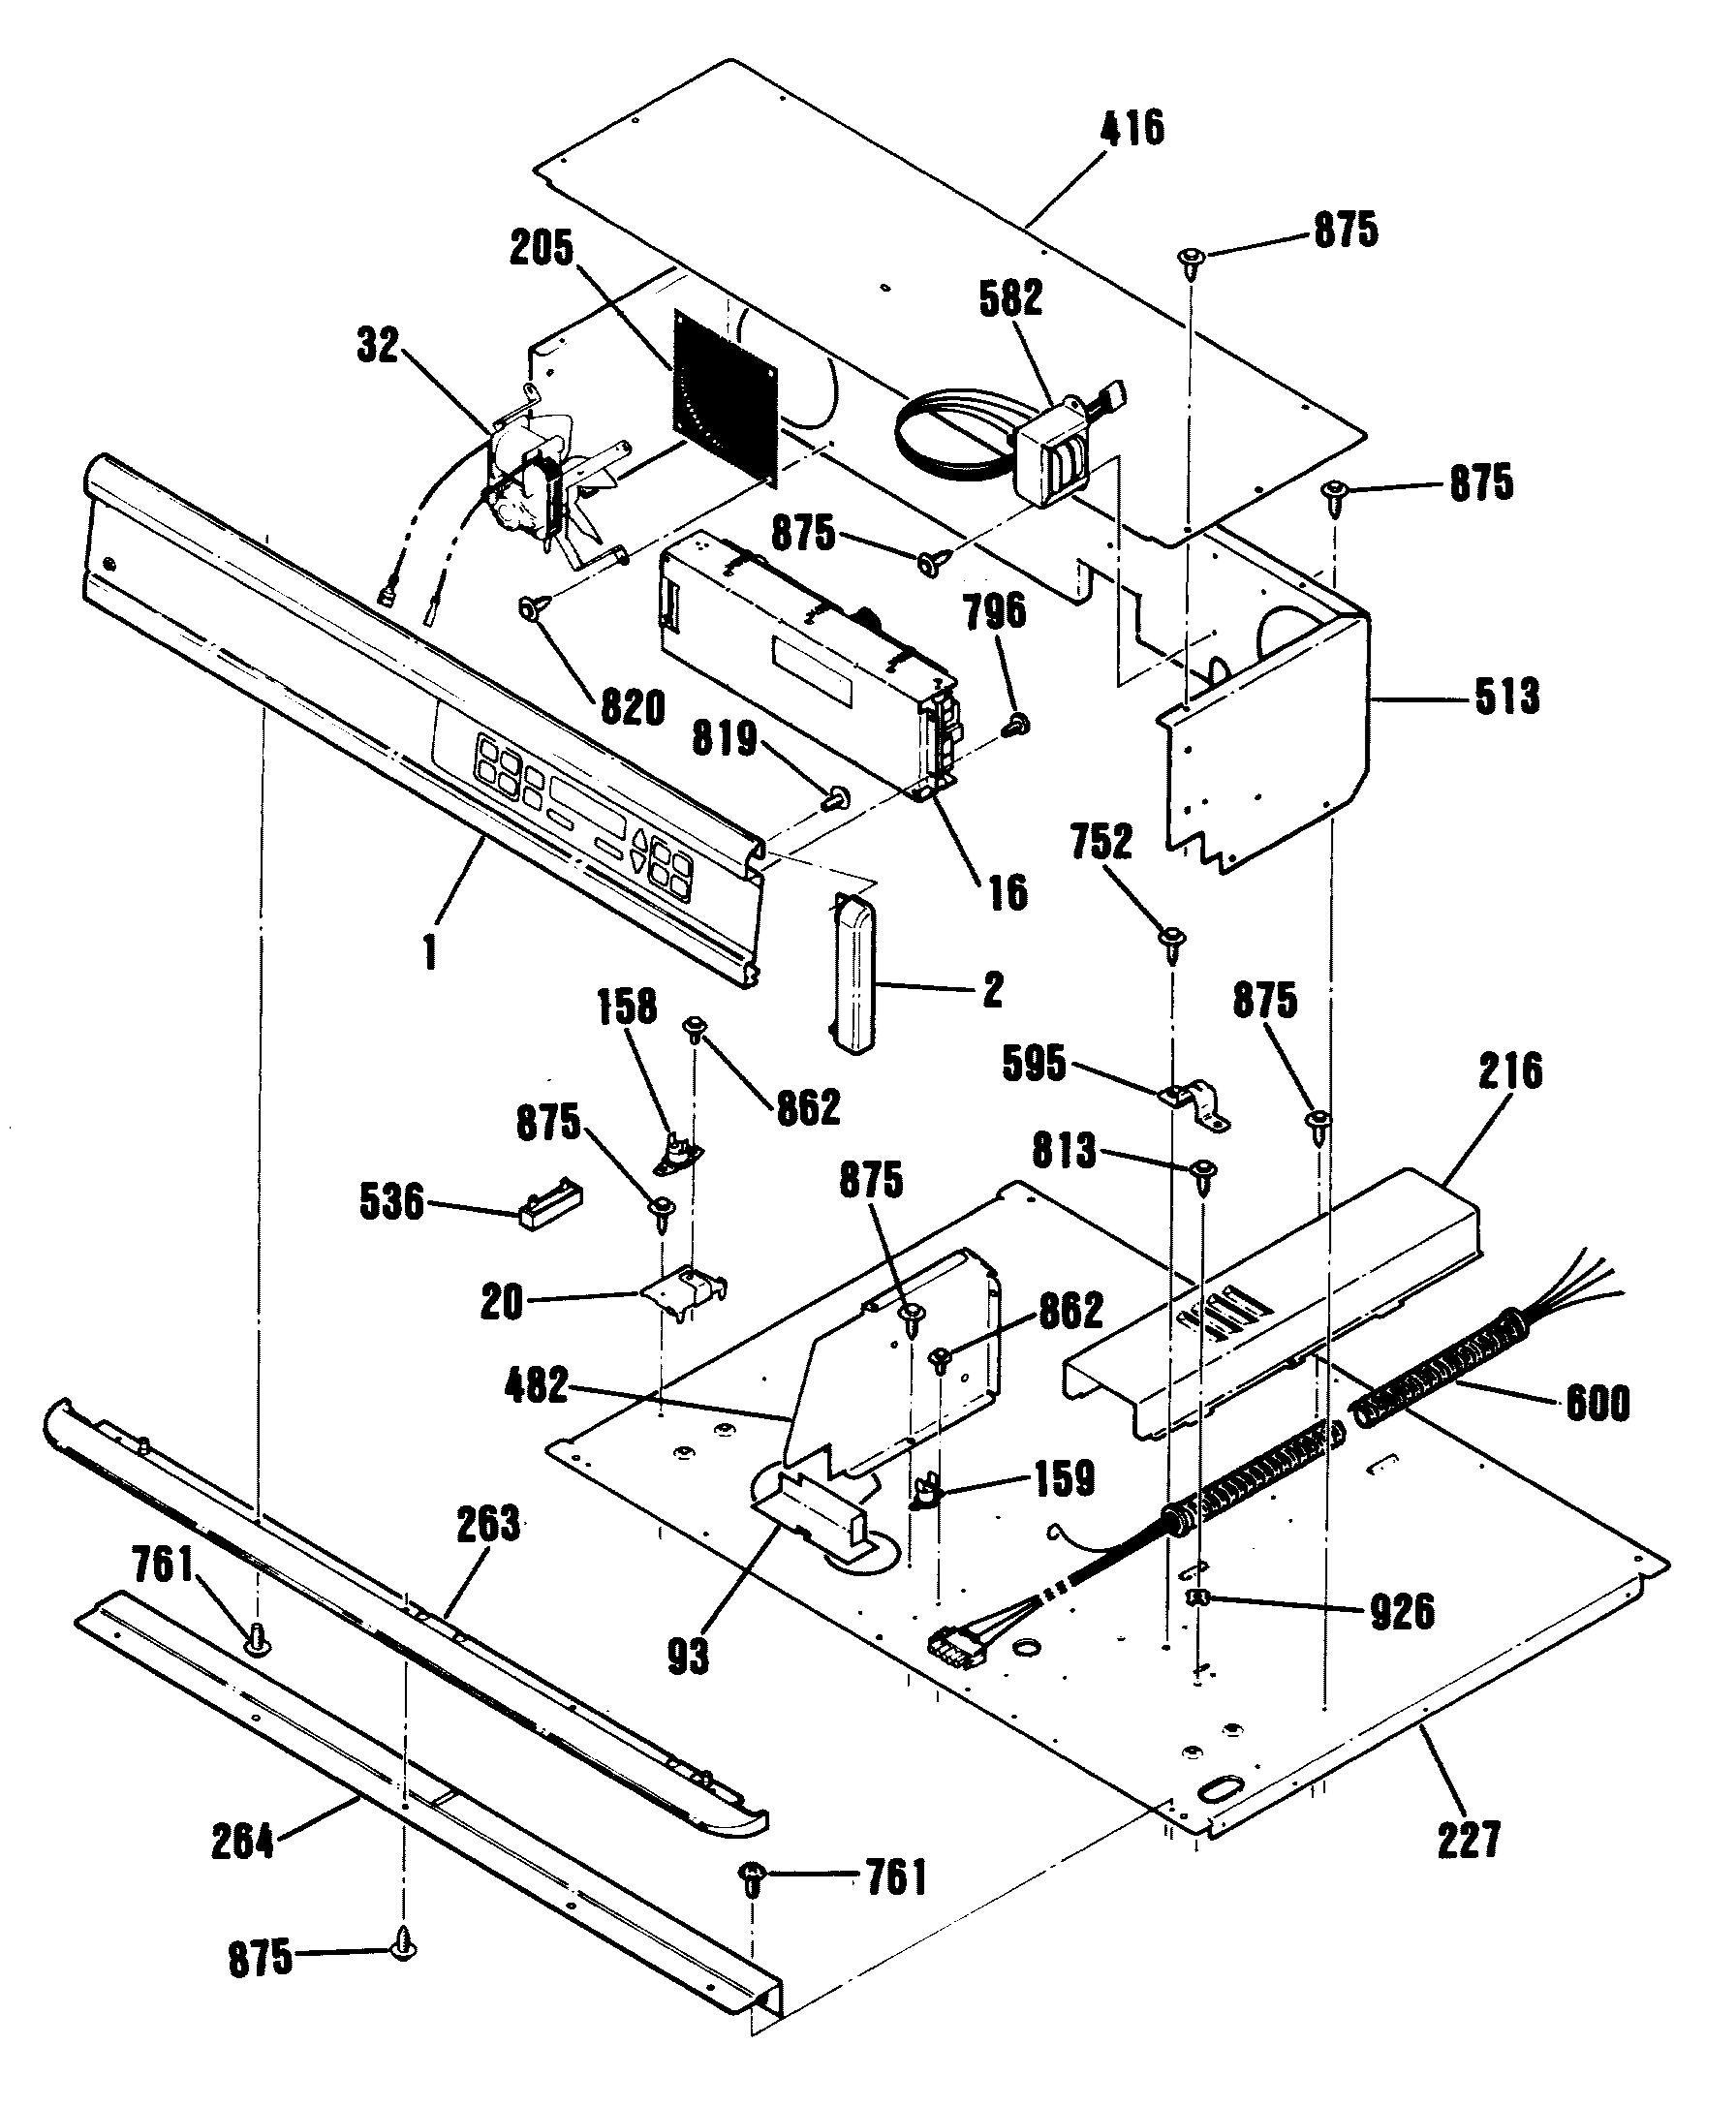 Pt Inr Wiring Diagram LFT Fishbone Diagram Wiring Diagram